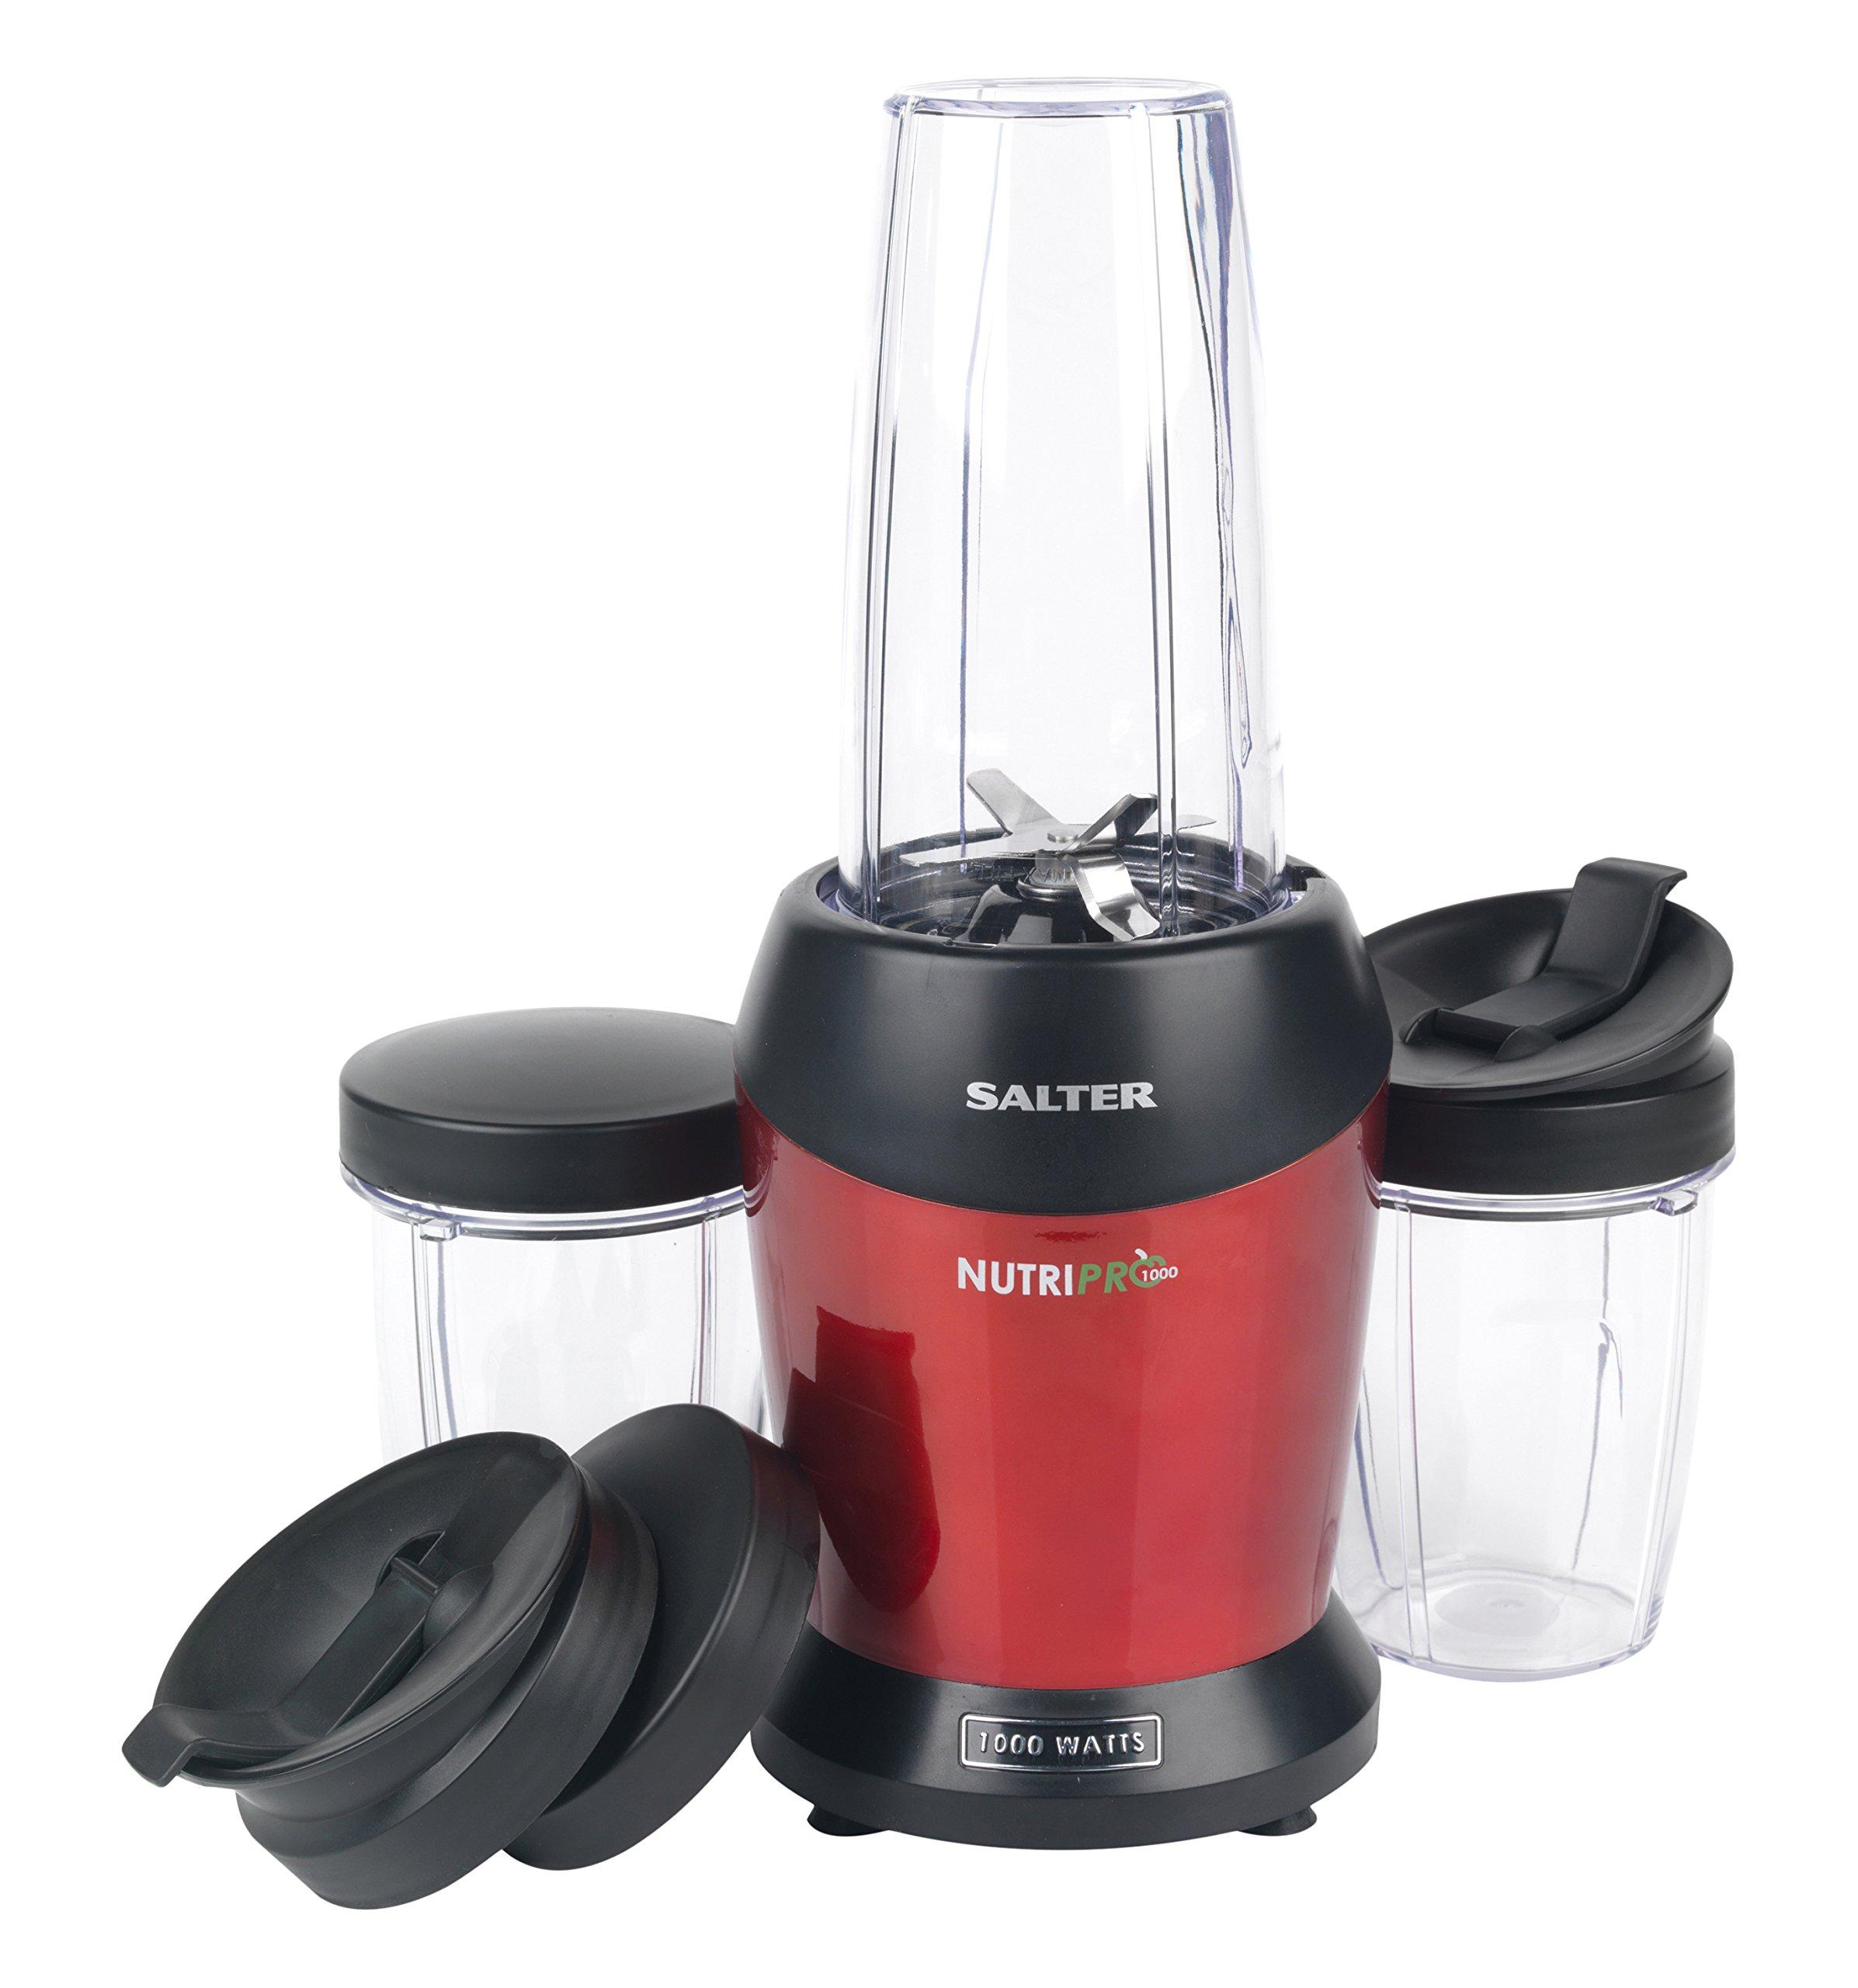 Salter Nutri Pro 1200 Blender Red